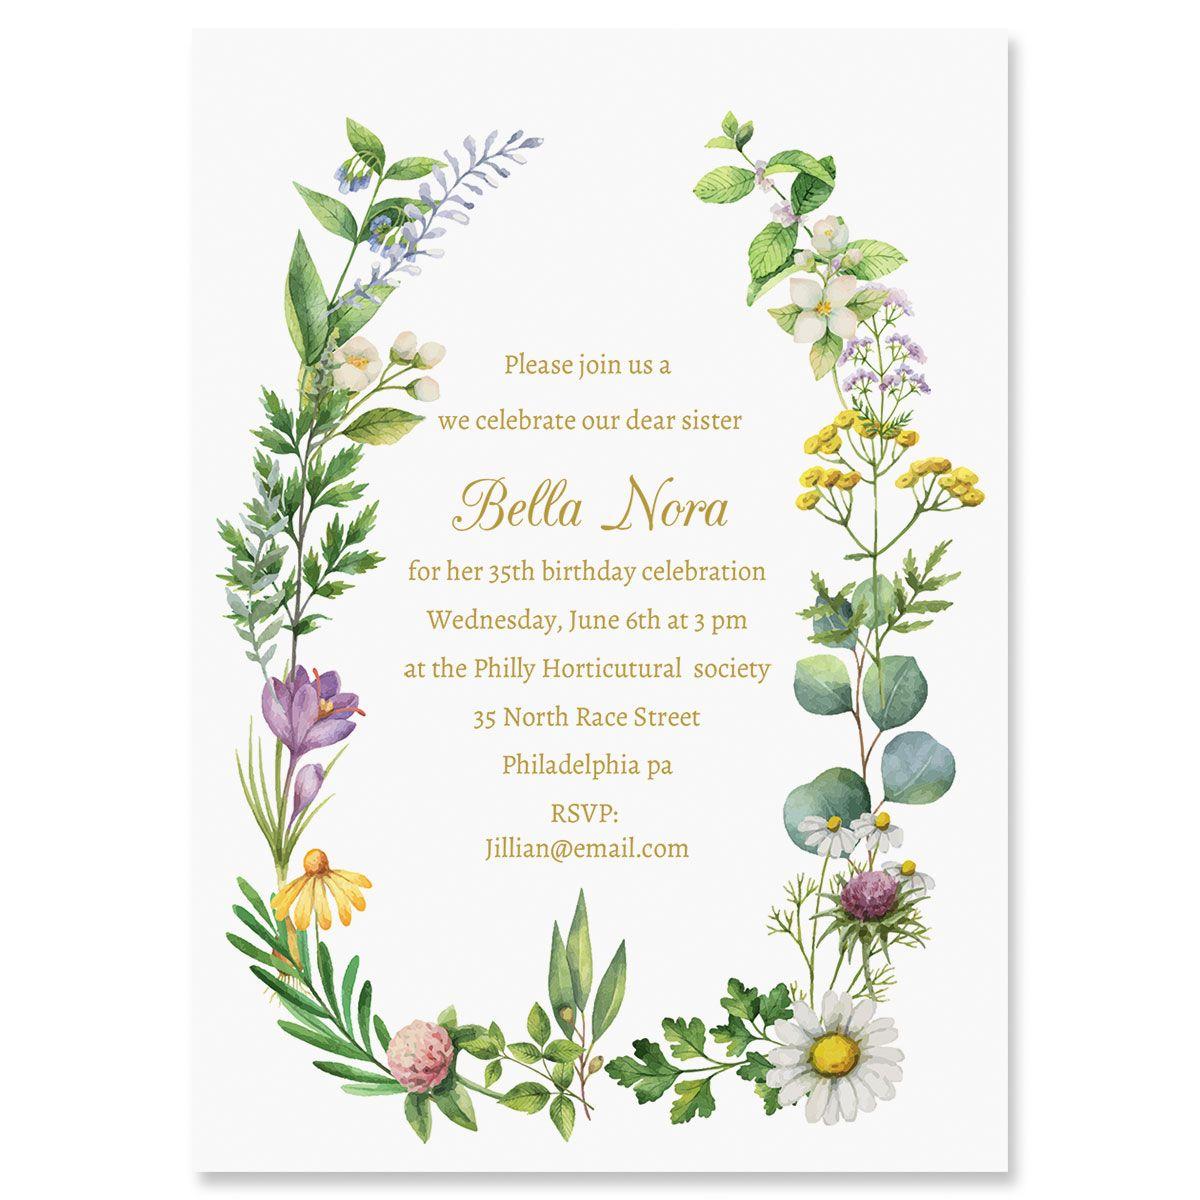 Personalized Larual Botanical Invitations